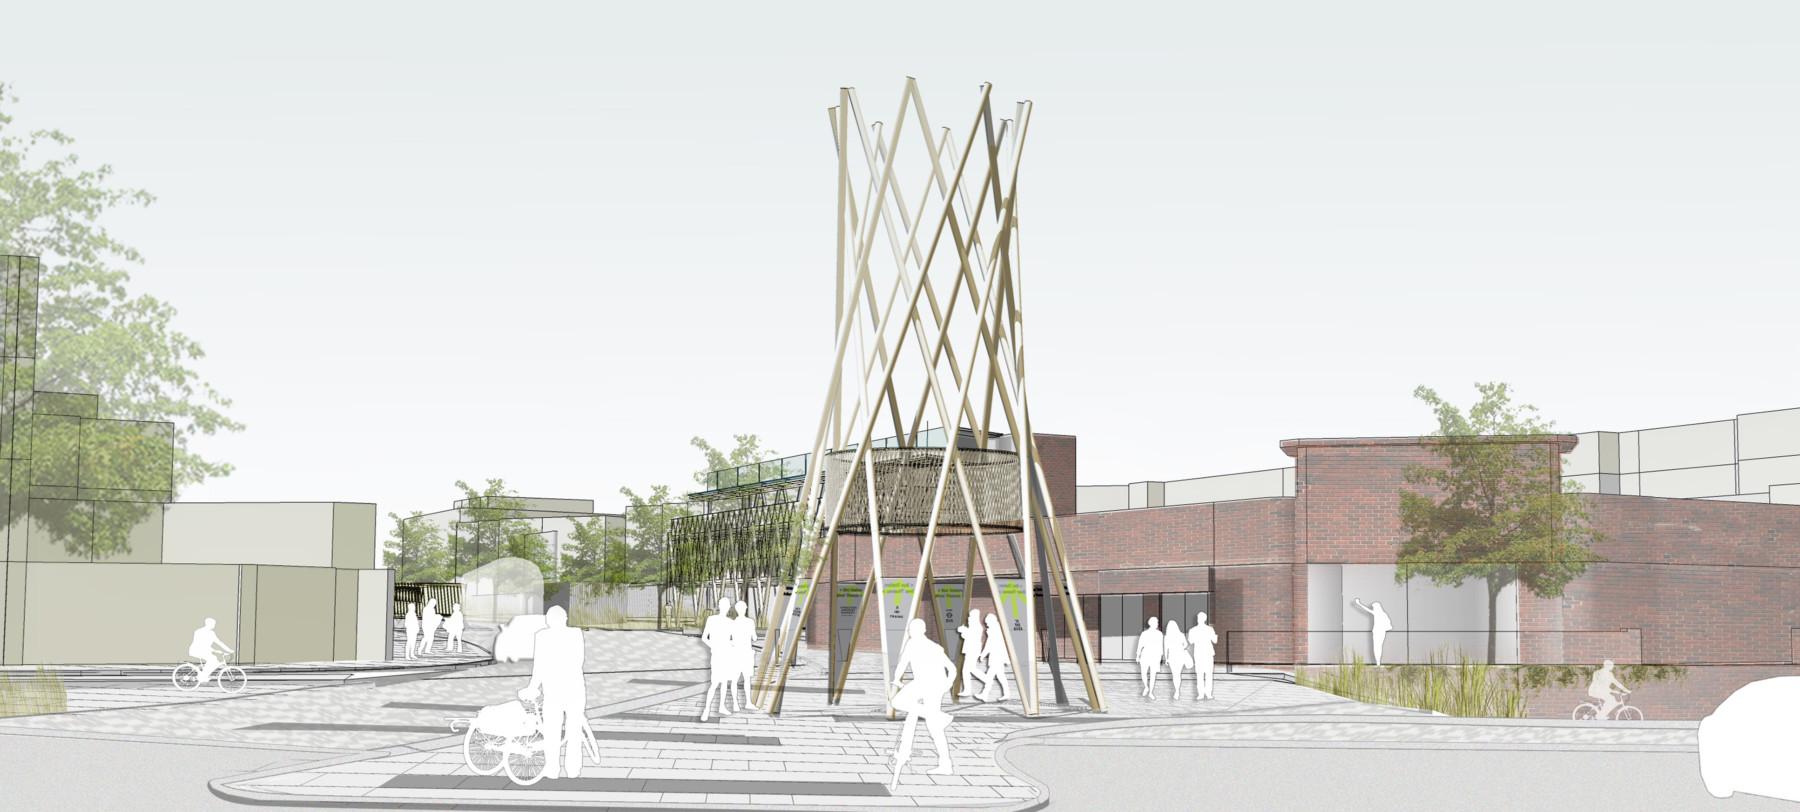 Sarah-Wigglesworth-Architects Kingston-Mini-Holland Beacon 1 Overall 3600